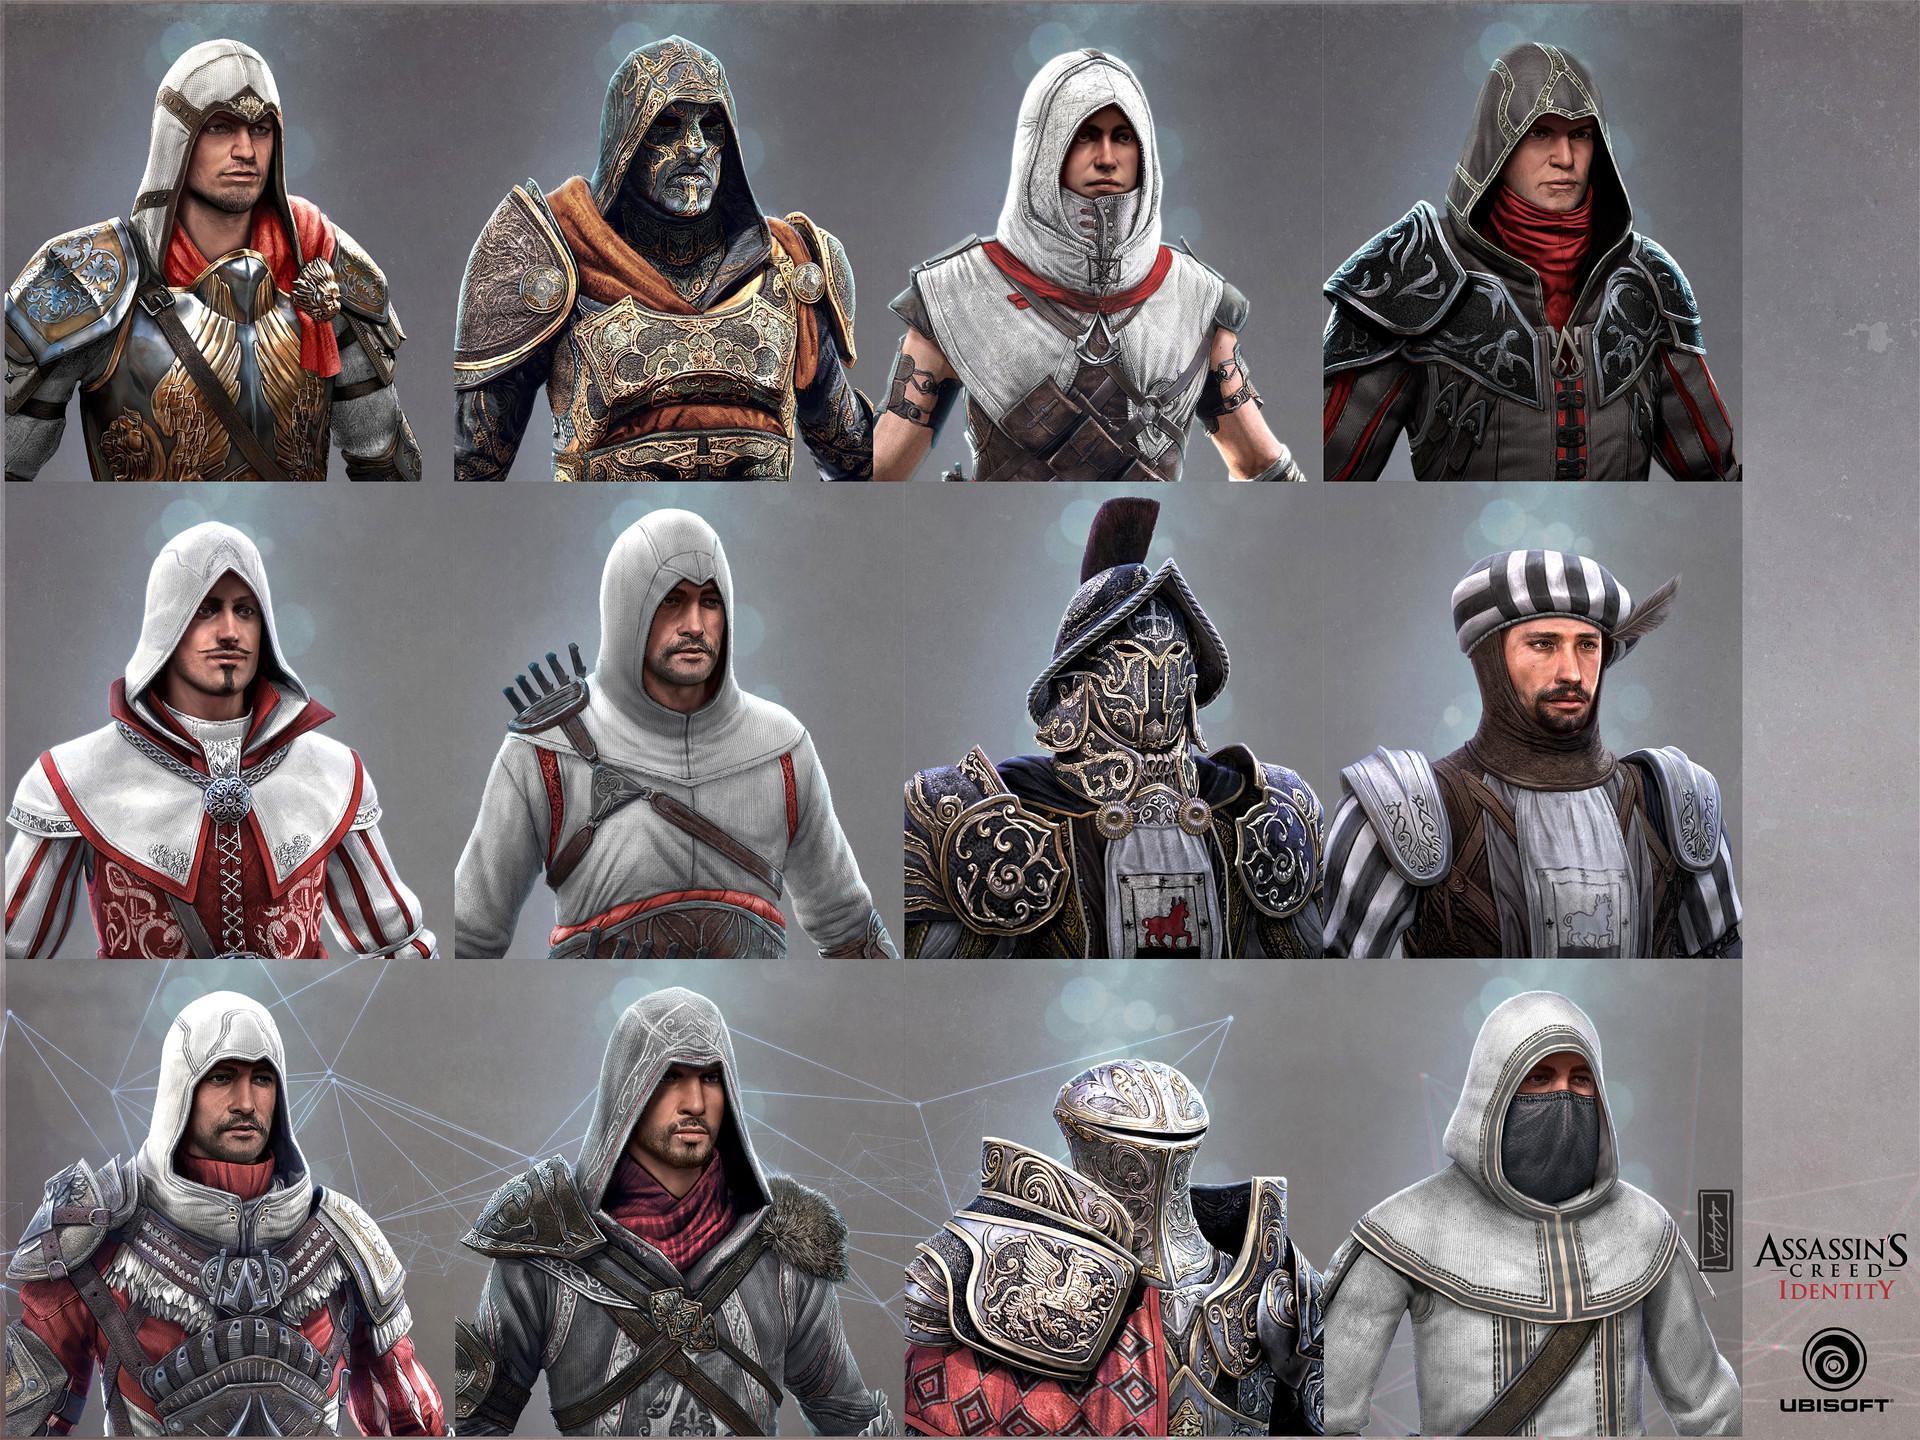 ArtStation - Assassin's Creed Identity Portraits, Andi Drude